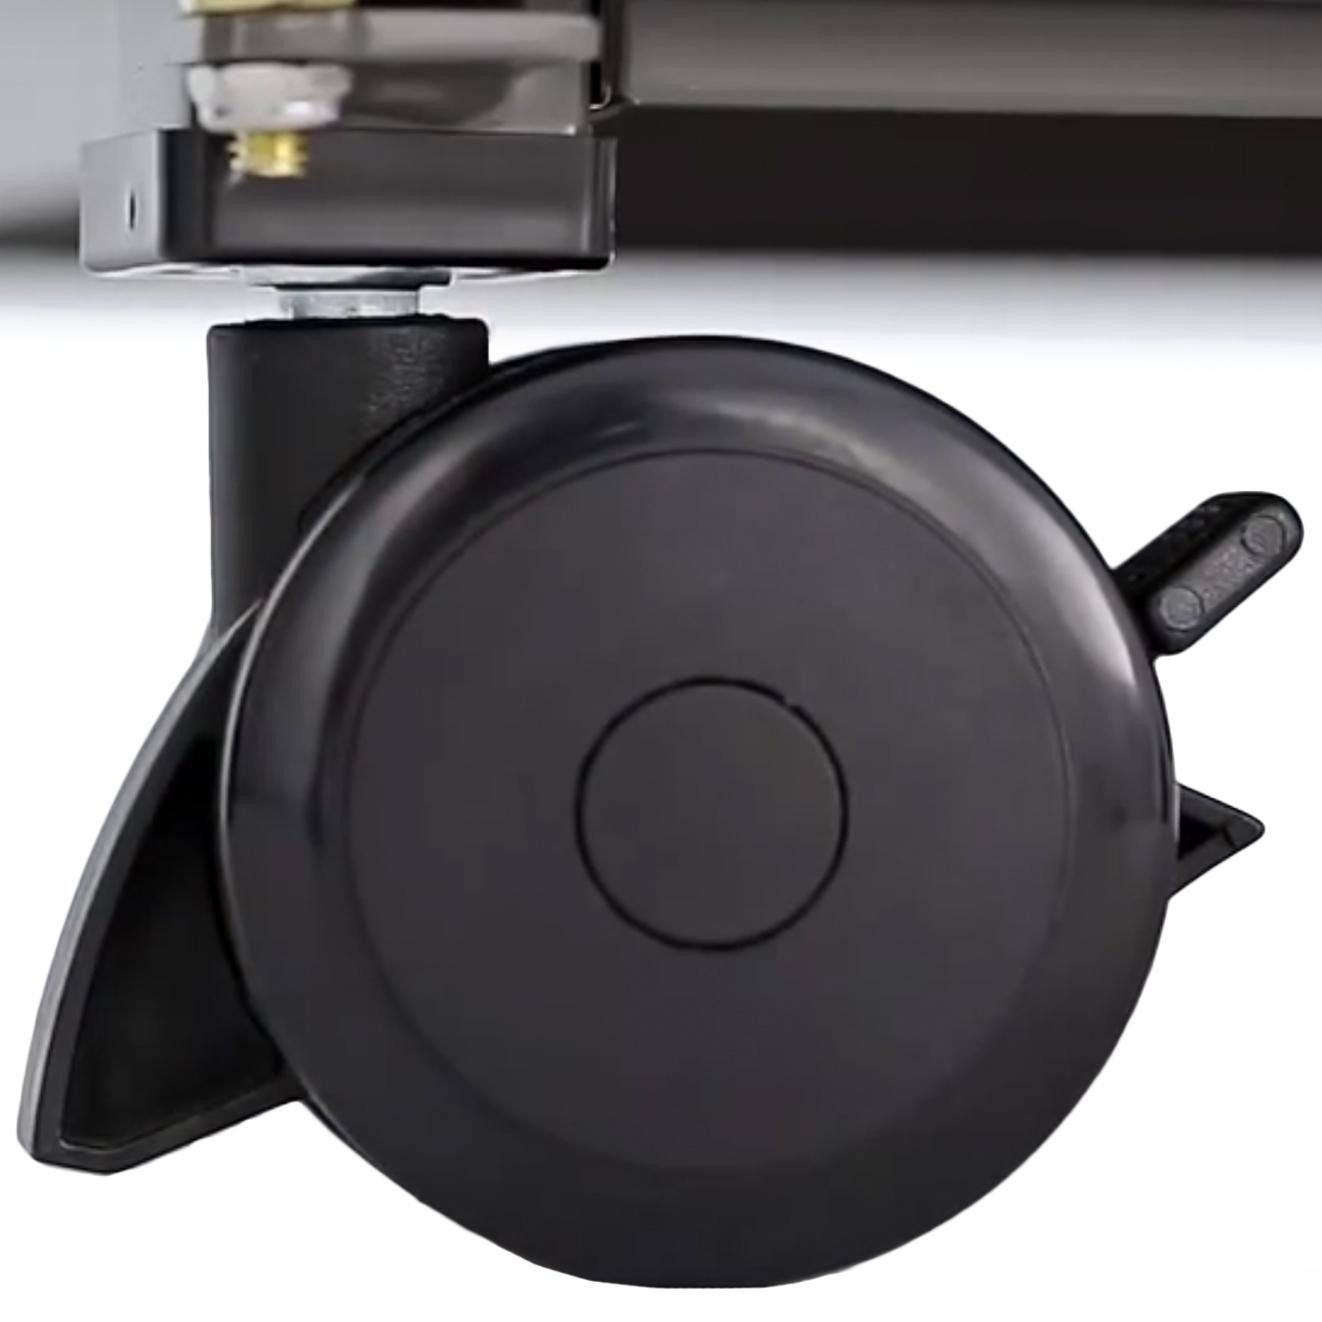 summit e 470 gbs grill in black weber grill original. Black Bedroom Furniture Sets. Home Design Ideas